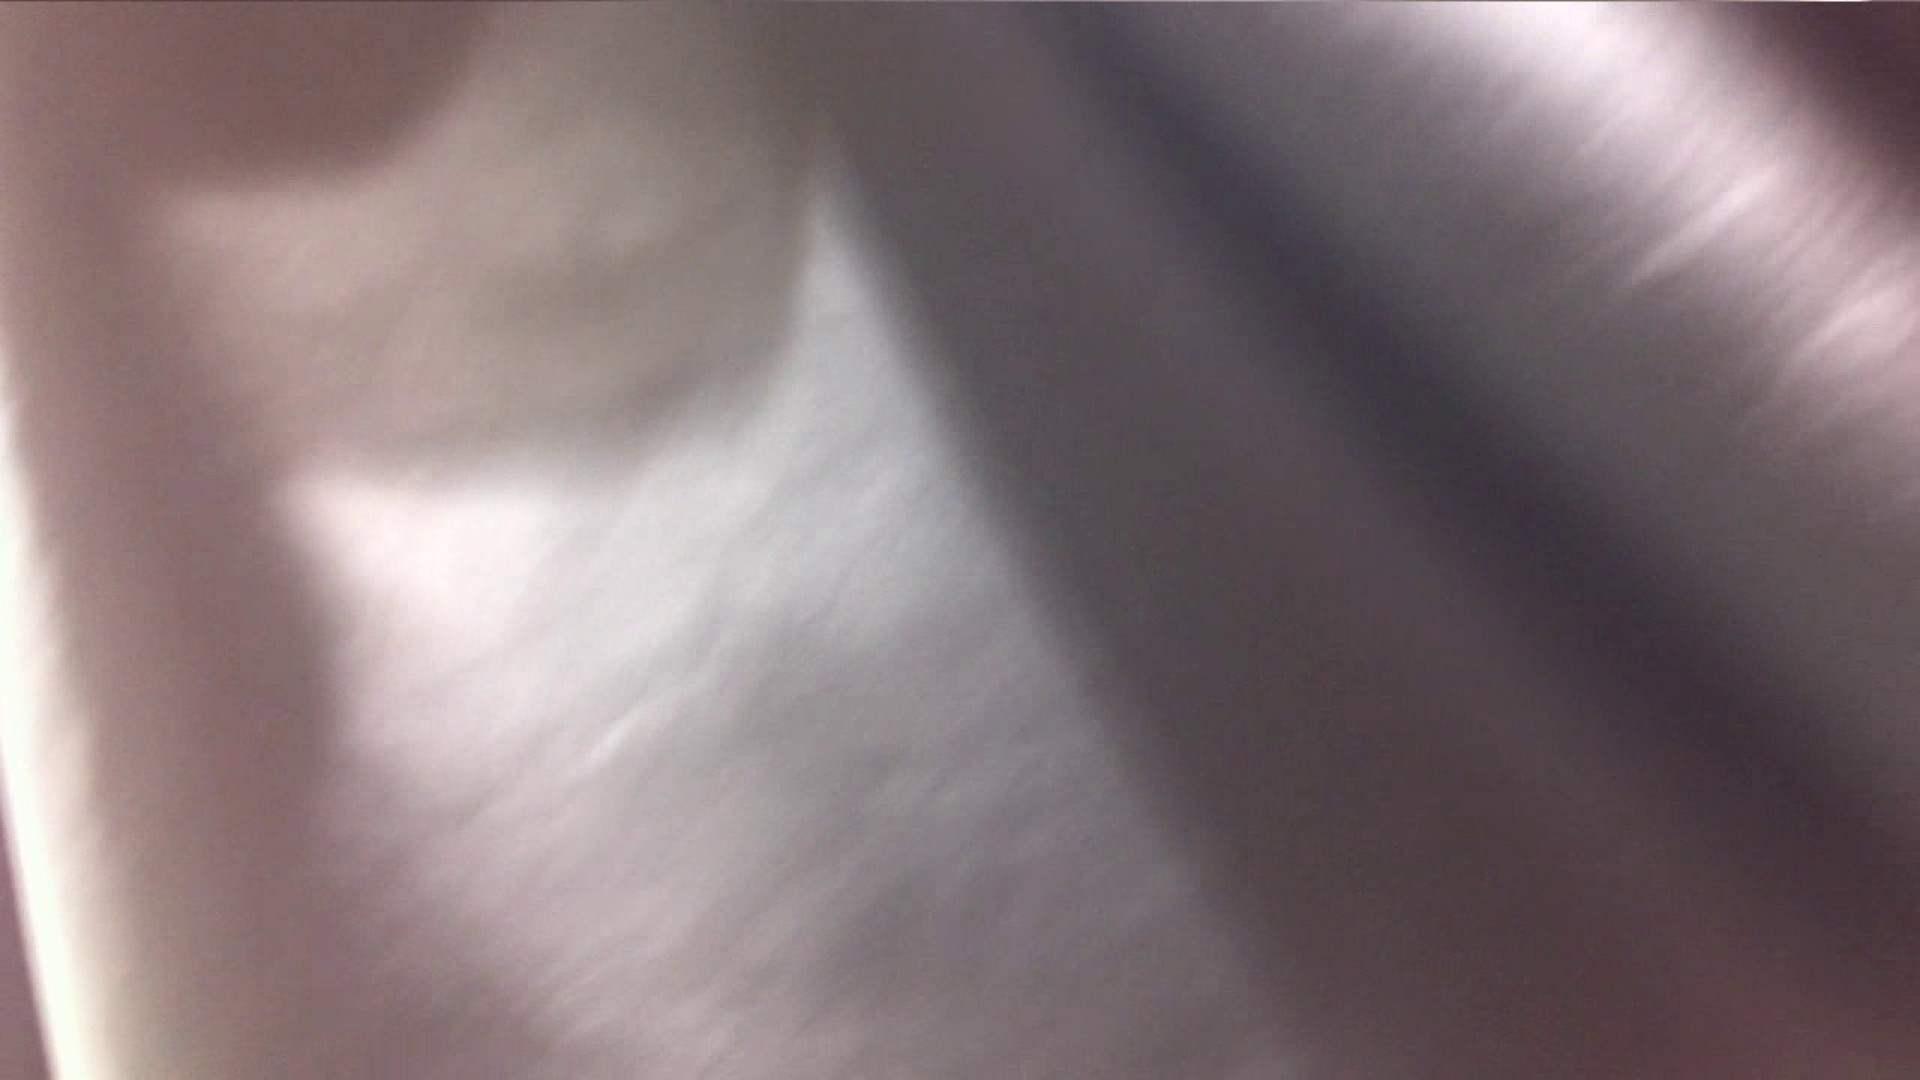 vol.38 美人アパレル胸チラ&パンチラ いい感じに食い込んでます 接写 盗み撮りオマンコ動画キャプチャ 91画像 53